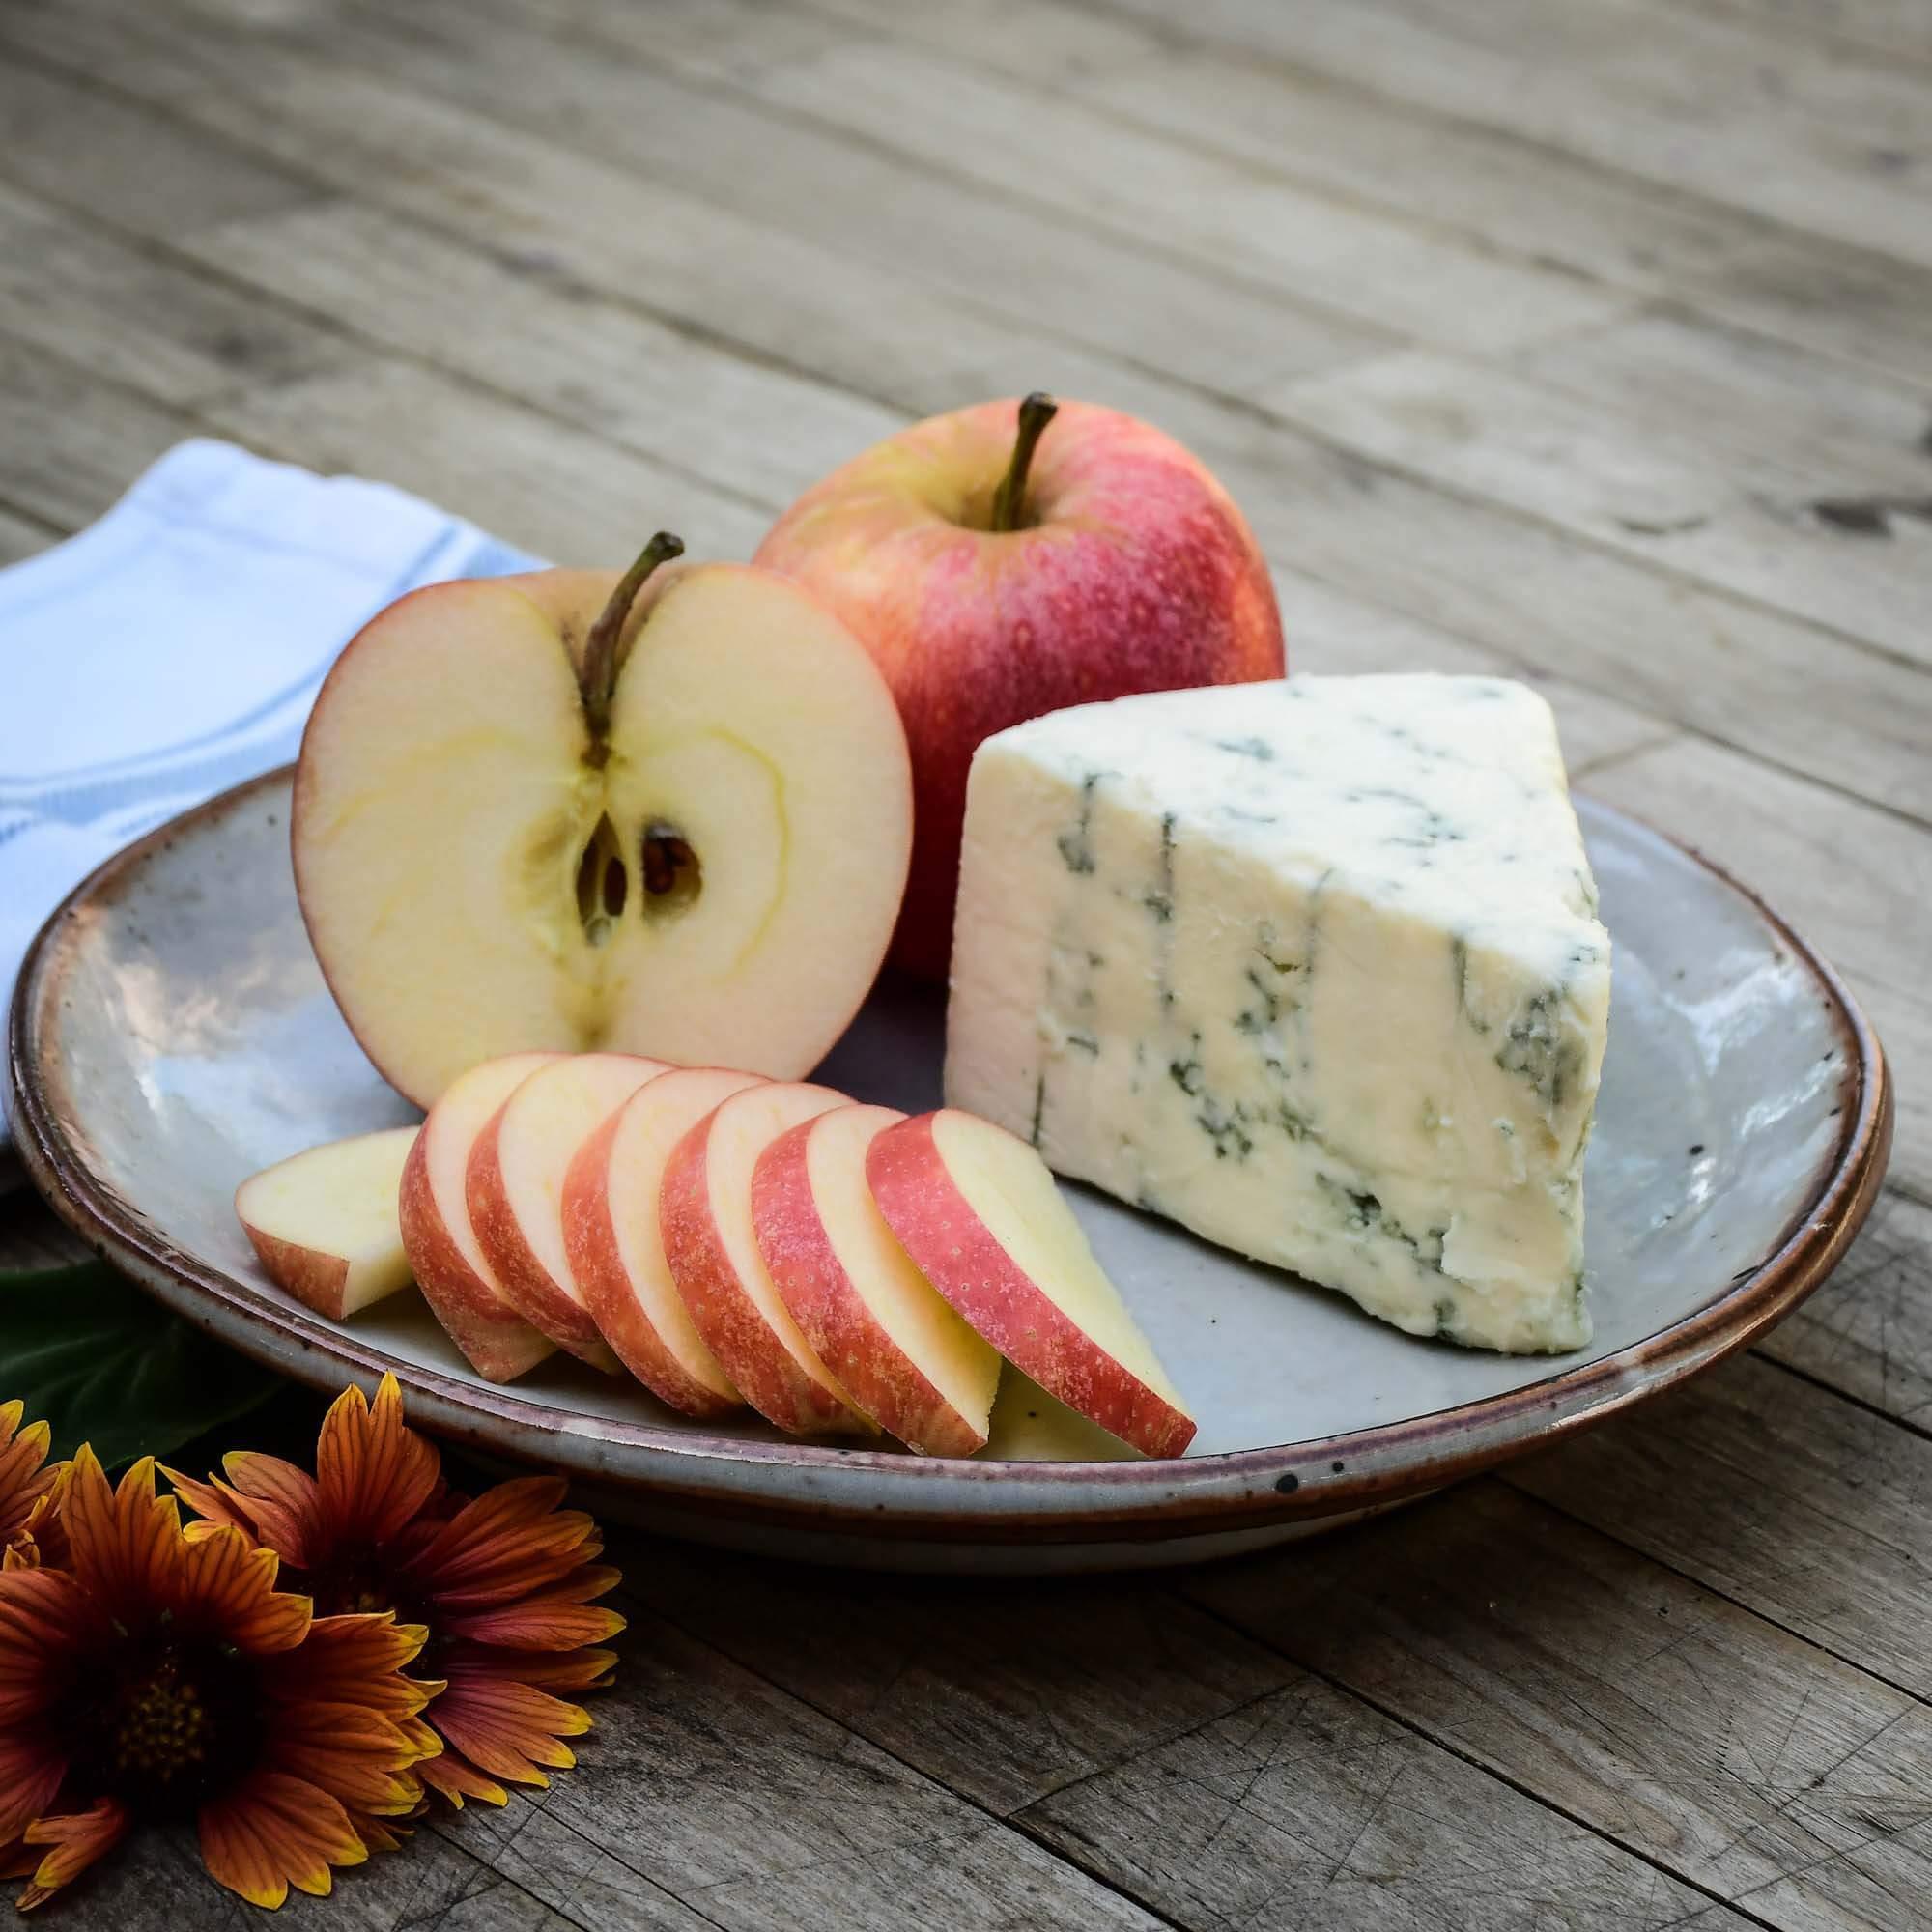 Apples & Cheese Box